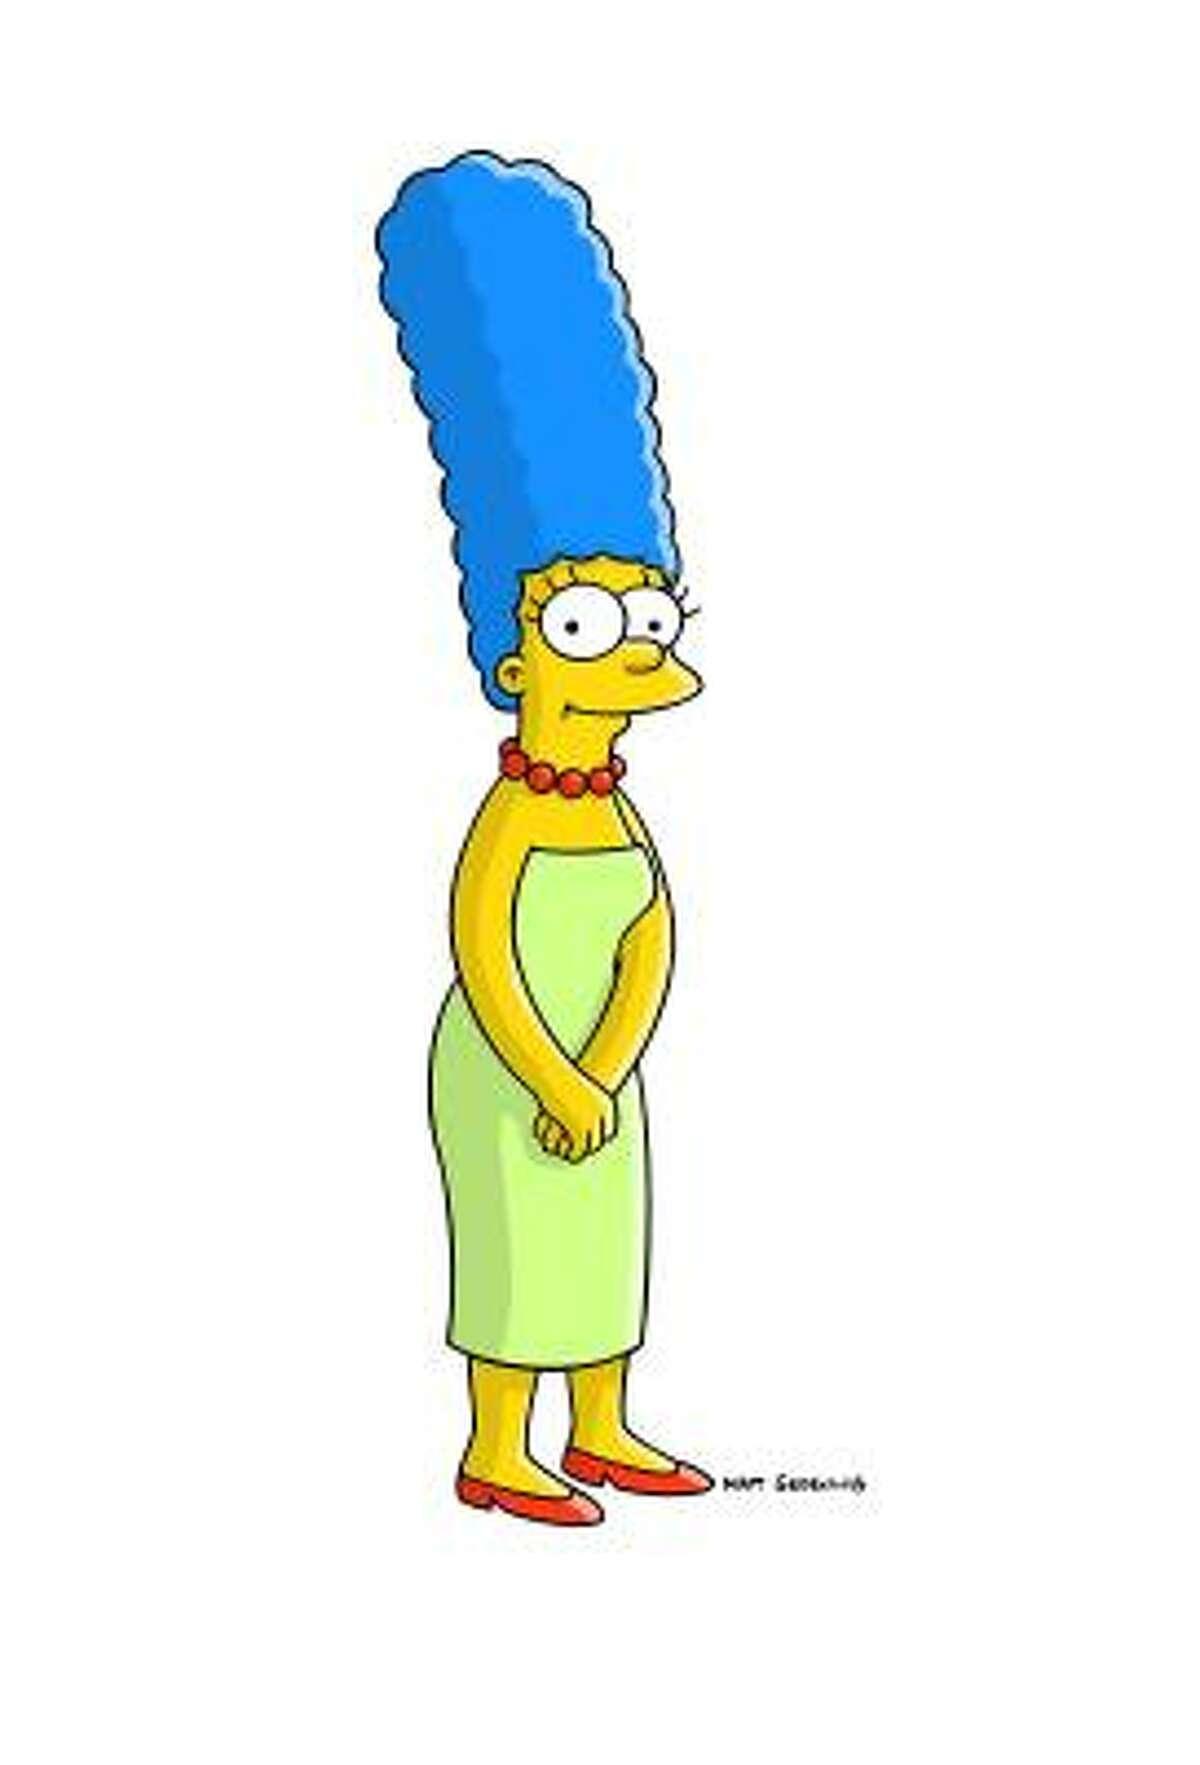 Marge Simpson: